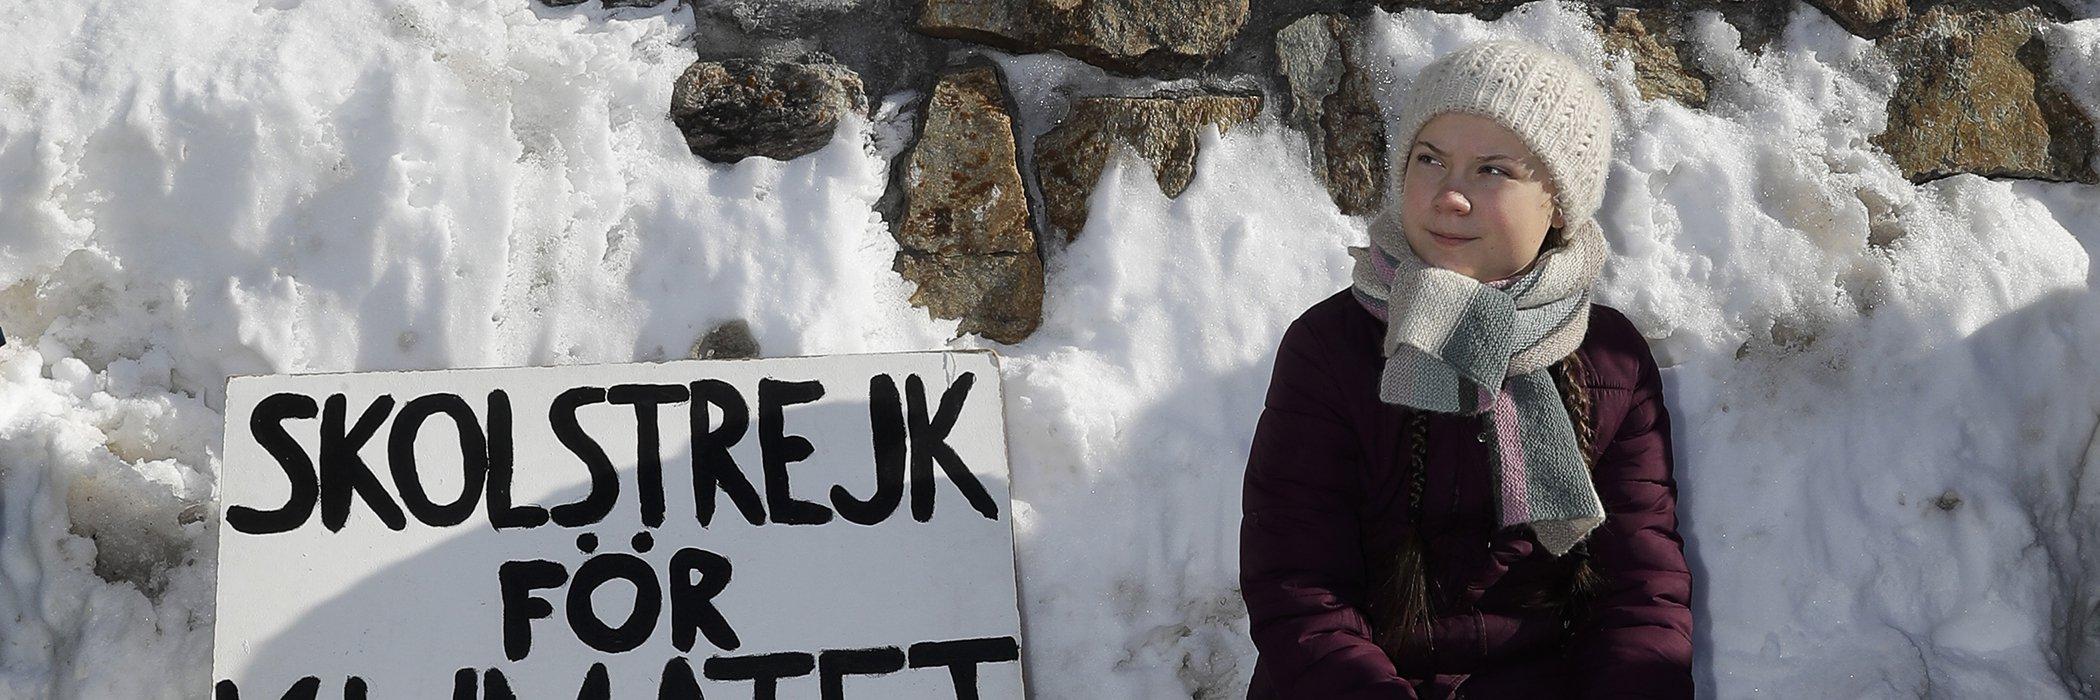 Greta Thunberg-Davos-Climate-Activist.jpg